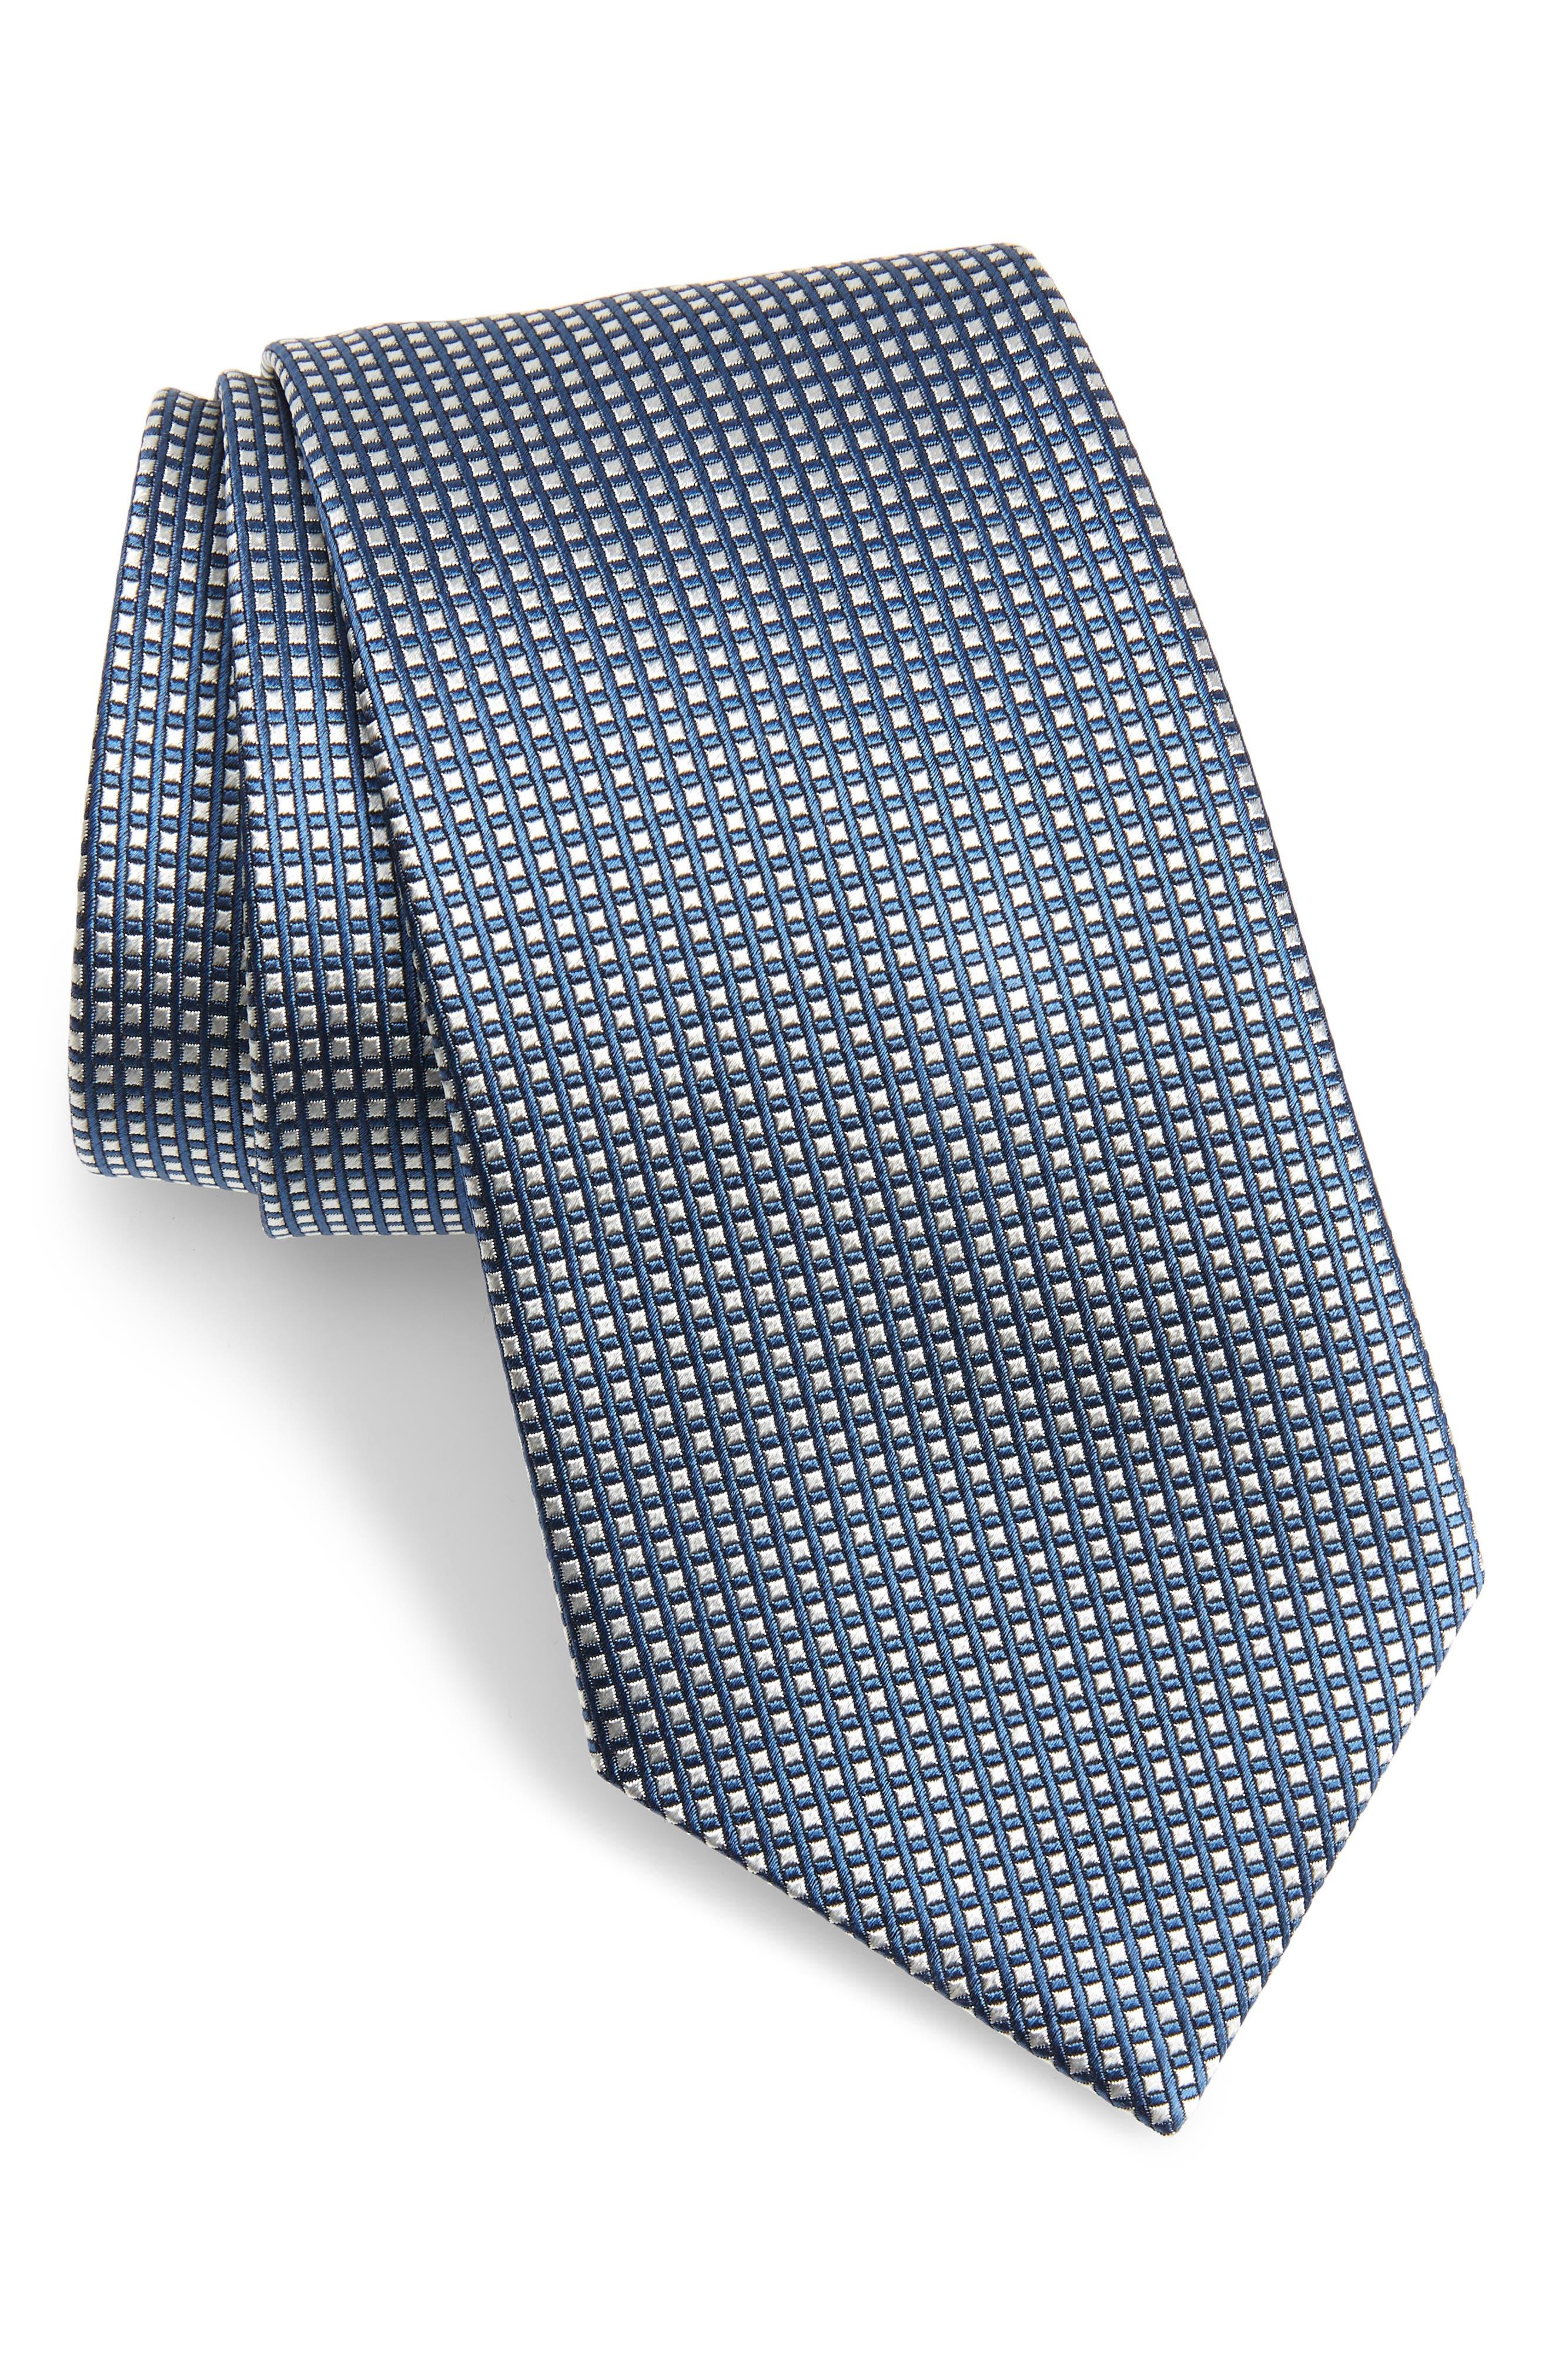 EMPORIO ARMANI, Plaid Silk Tie, Main thumbnail 1, color, BLUE